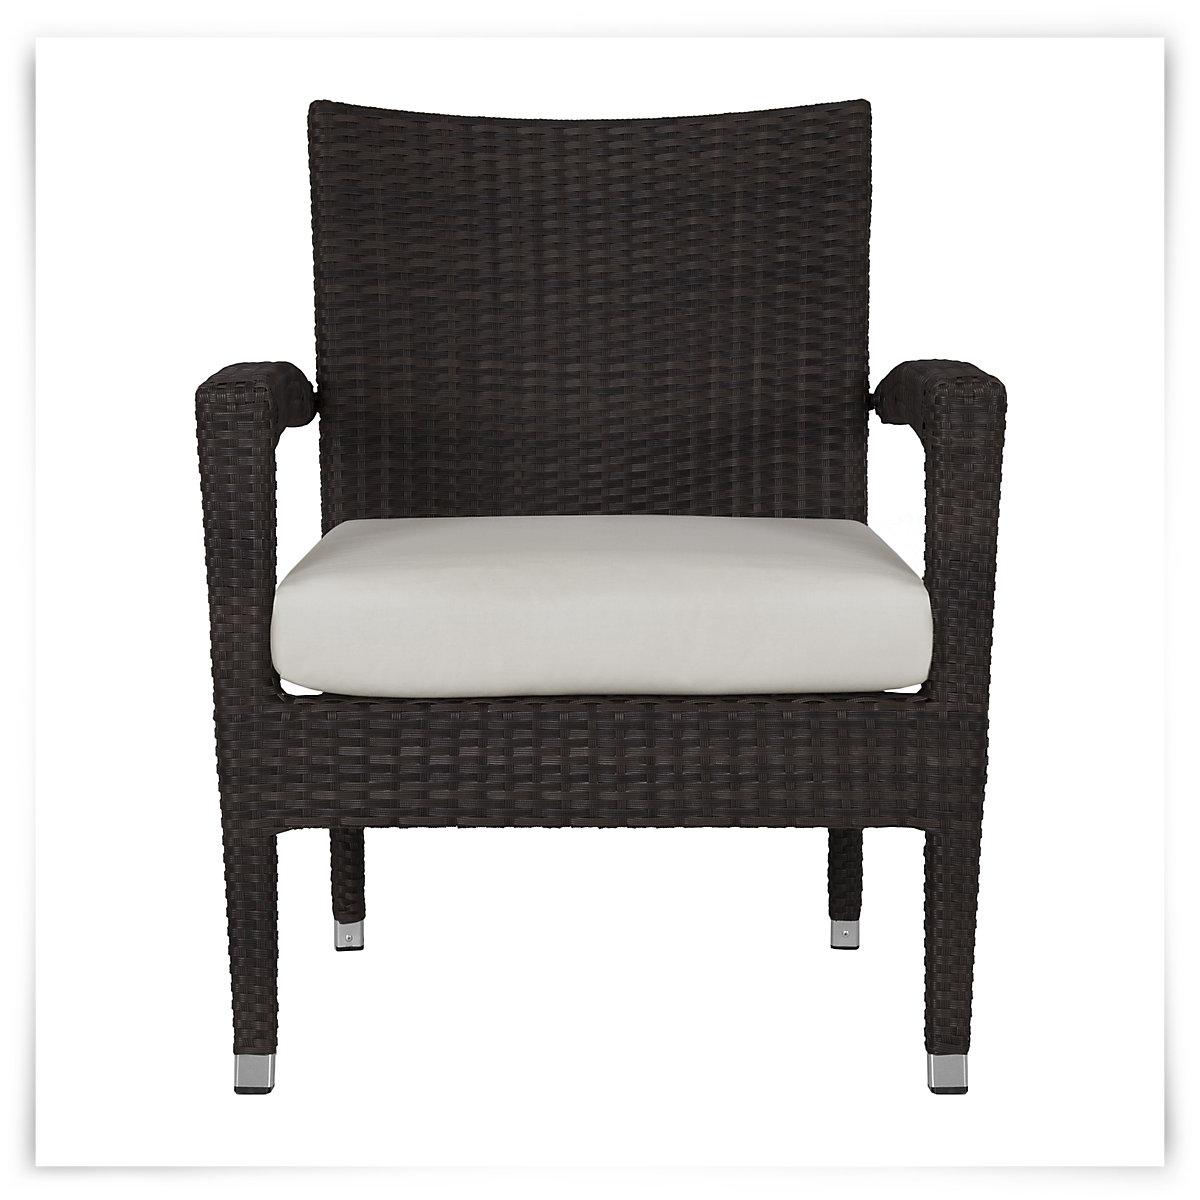 City Furniture Zen White Chair